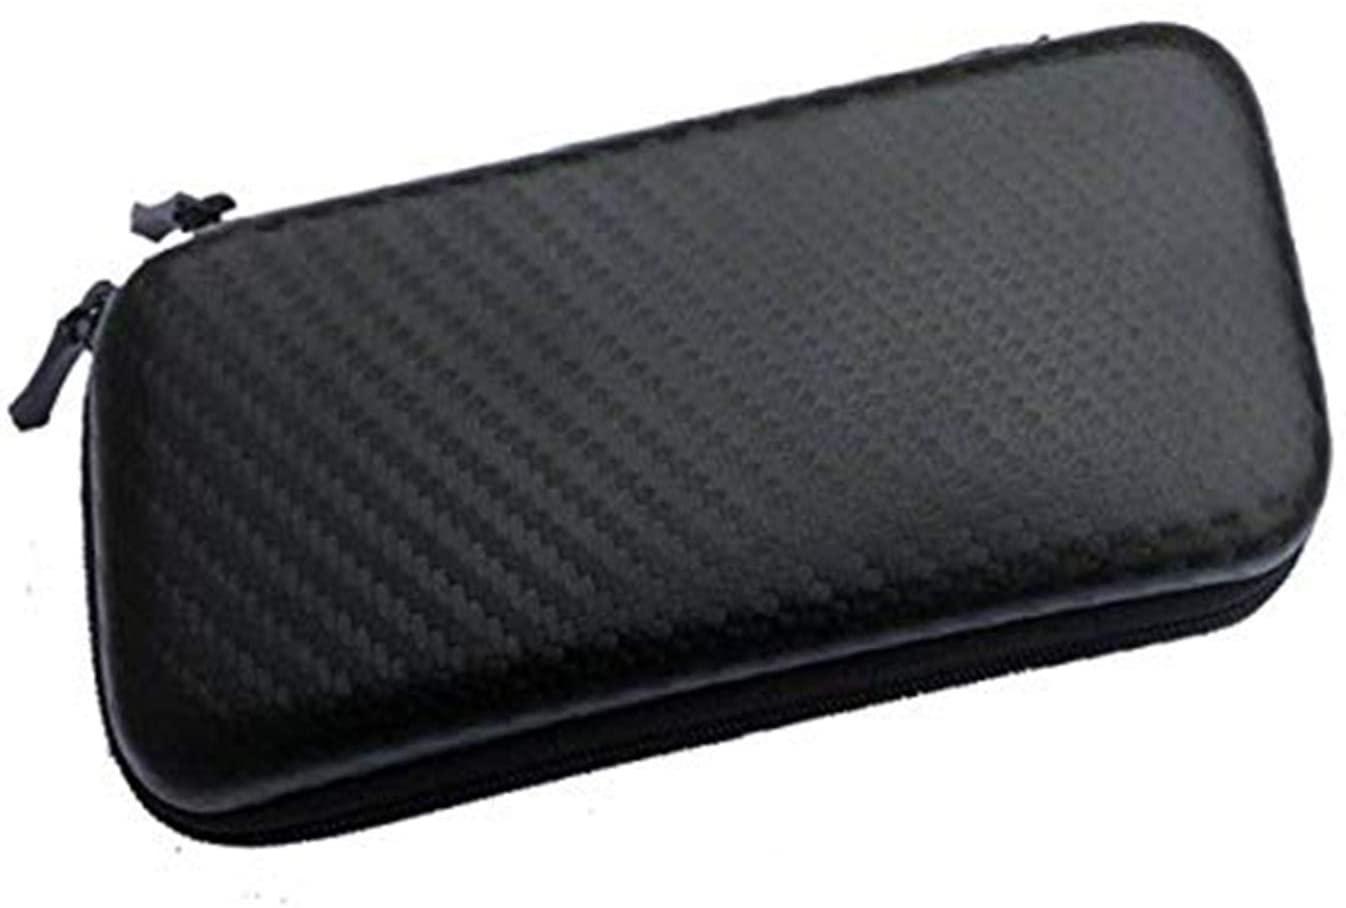 Kehuashina TS100 TS80 Soldering Iron Portable Carry Case,Small Zipper Tool Pouch Organizer Bag